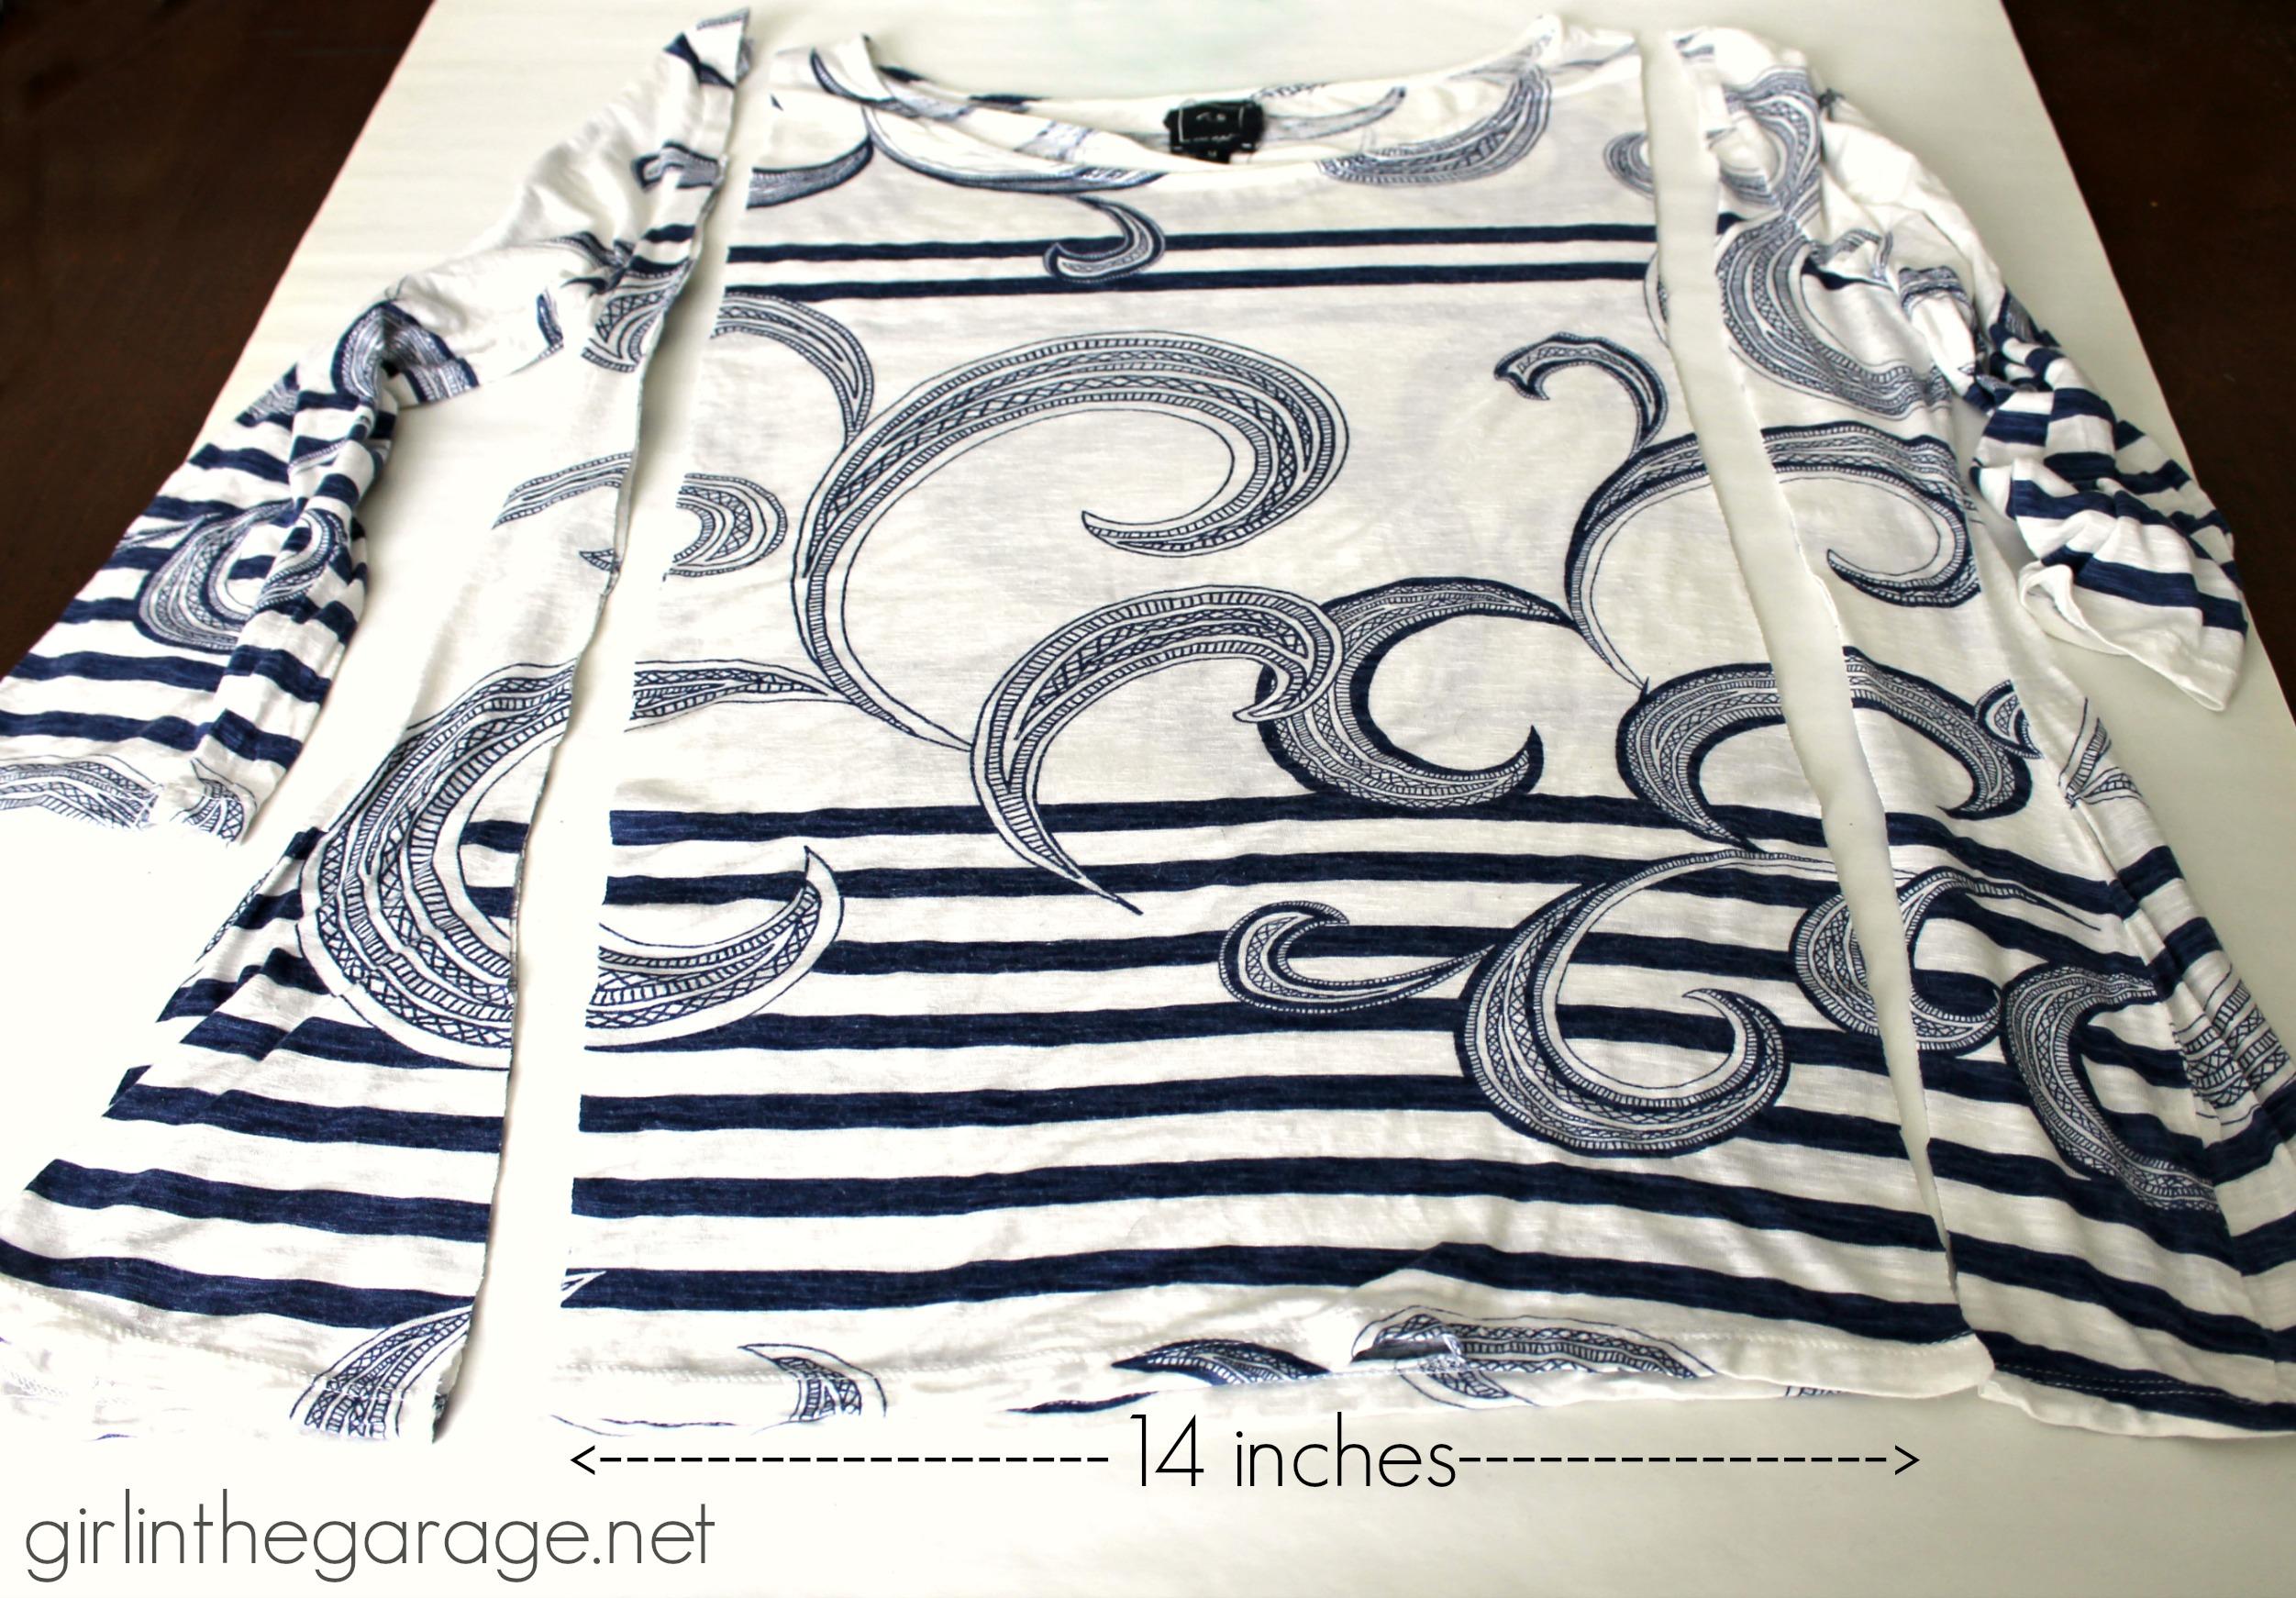 Shirt design easy - Easy Diy Tutorial T Shirt Into An Infinity Scarf Girlinthegarage Net